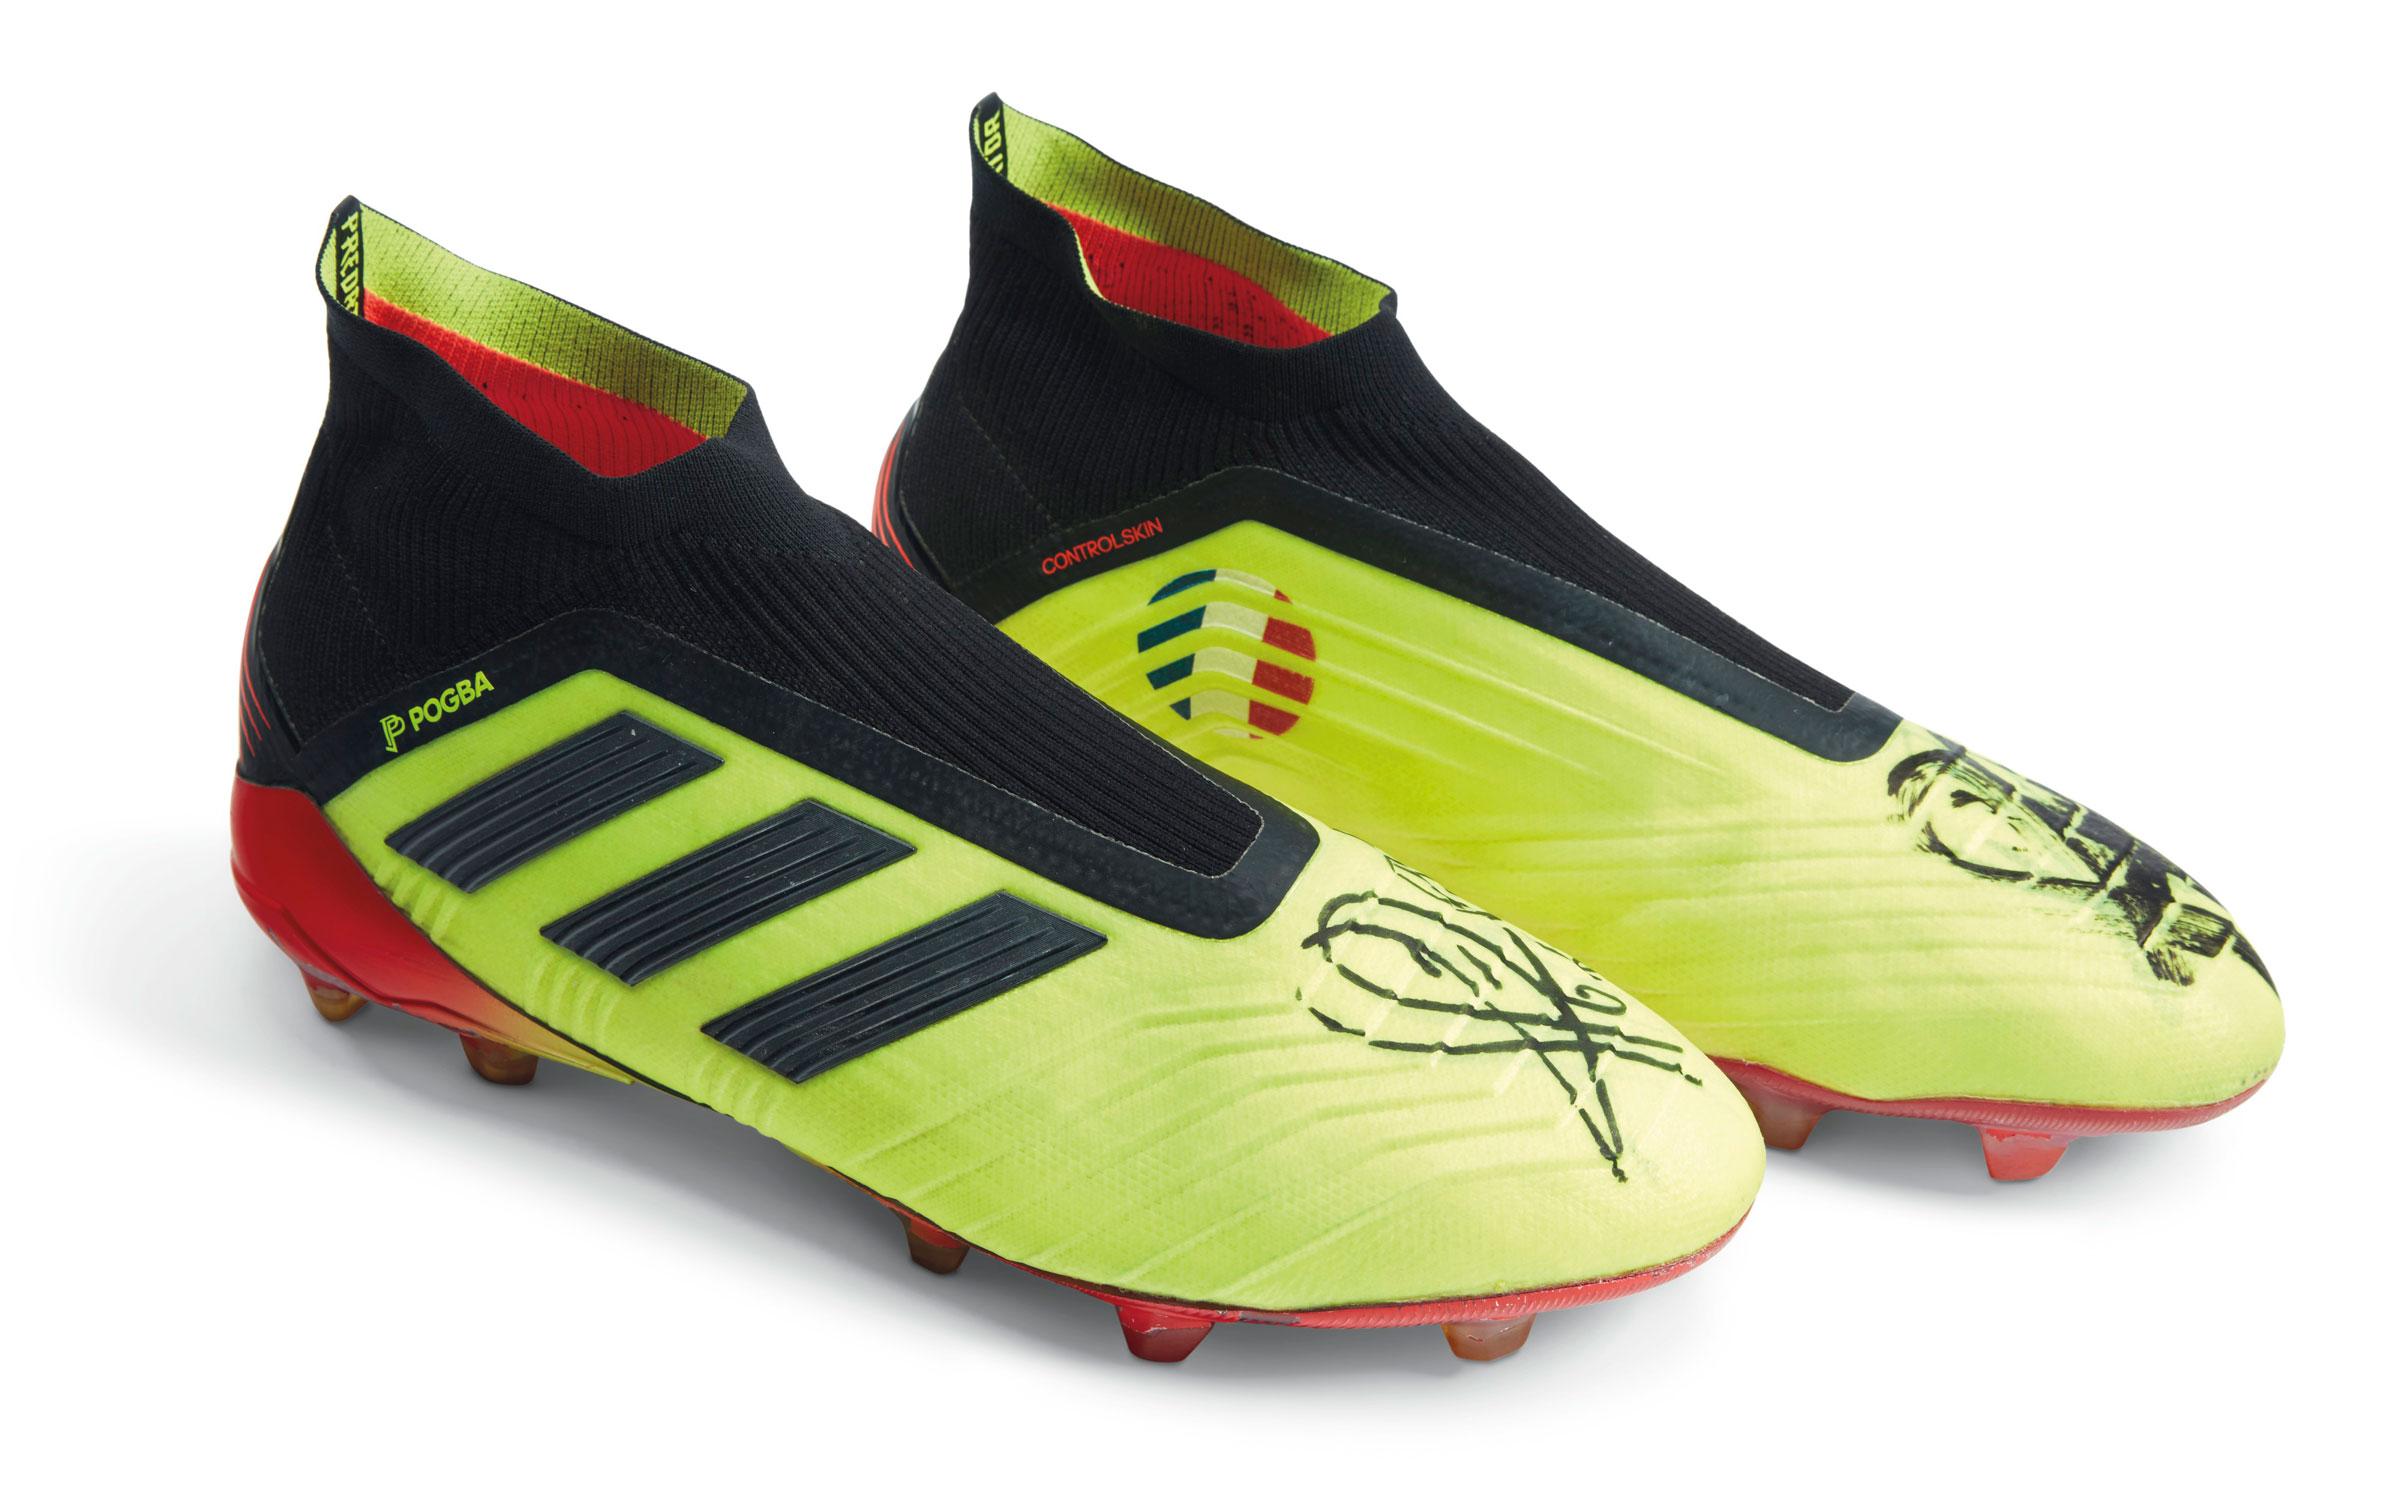 Paul Pogba's World Cup-winning boots